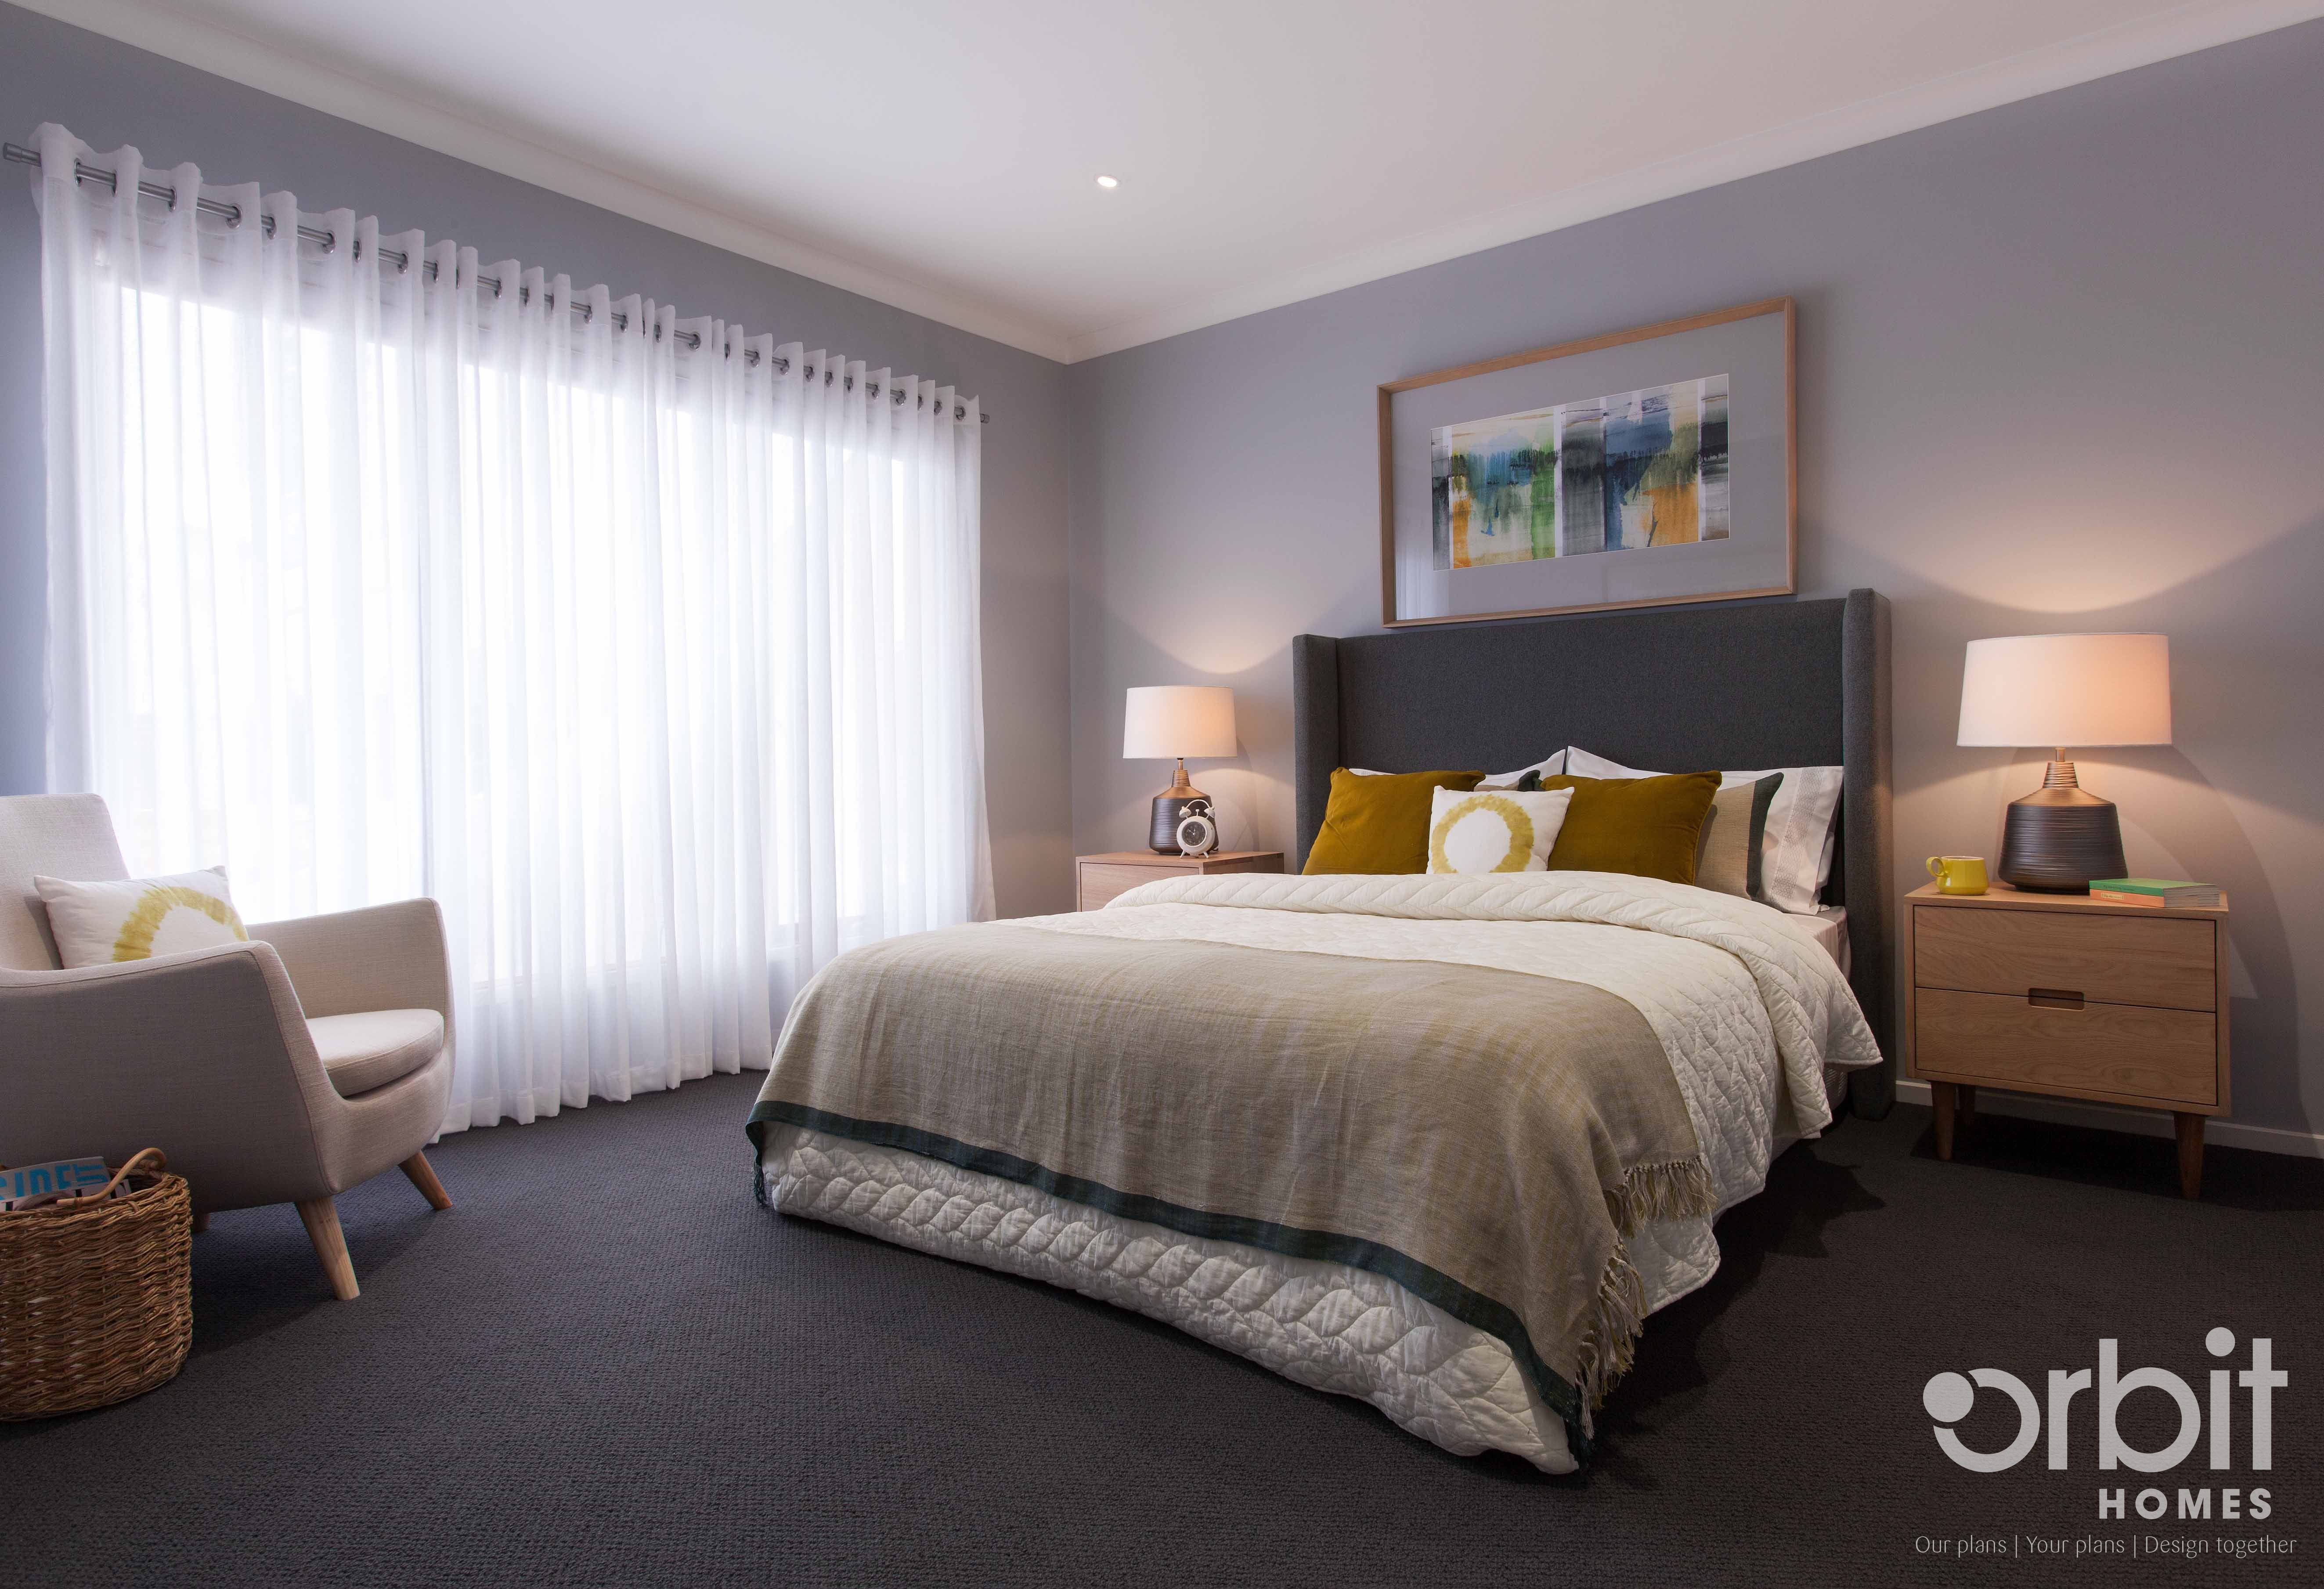 Orbit homes home builders - Orbit Homes Heathmont 227 Master Bedroom Parent Retreat The Spacious Master Bedroom